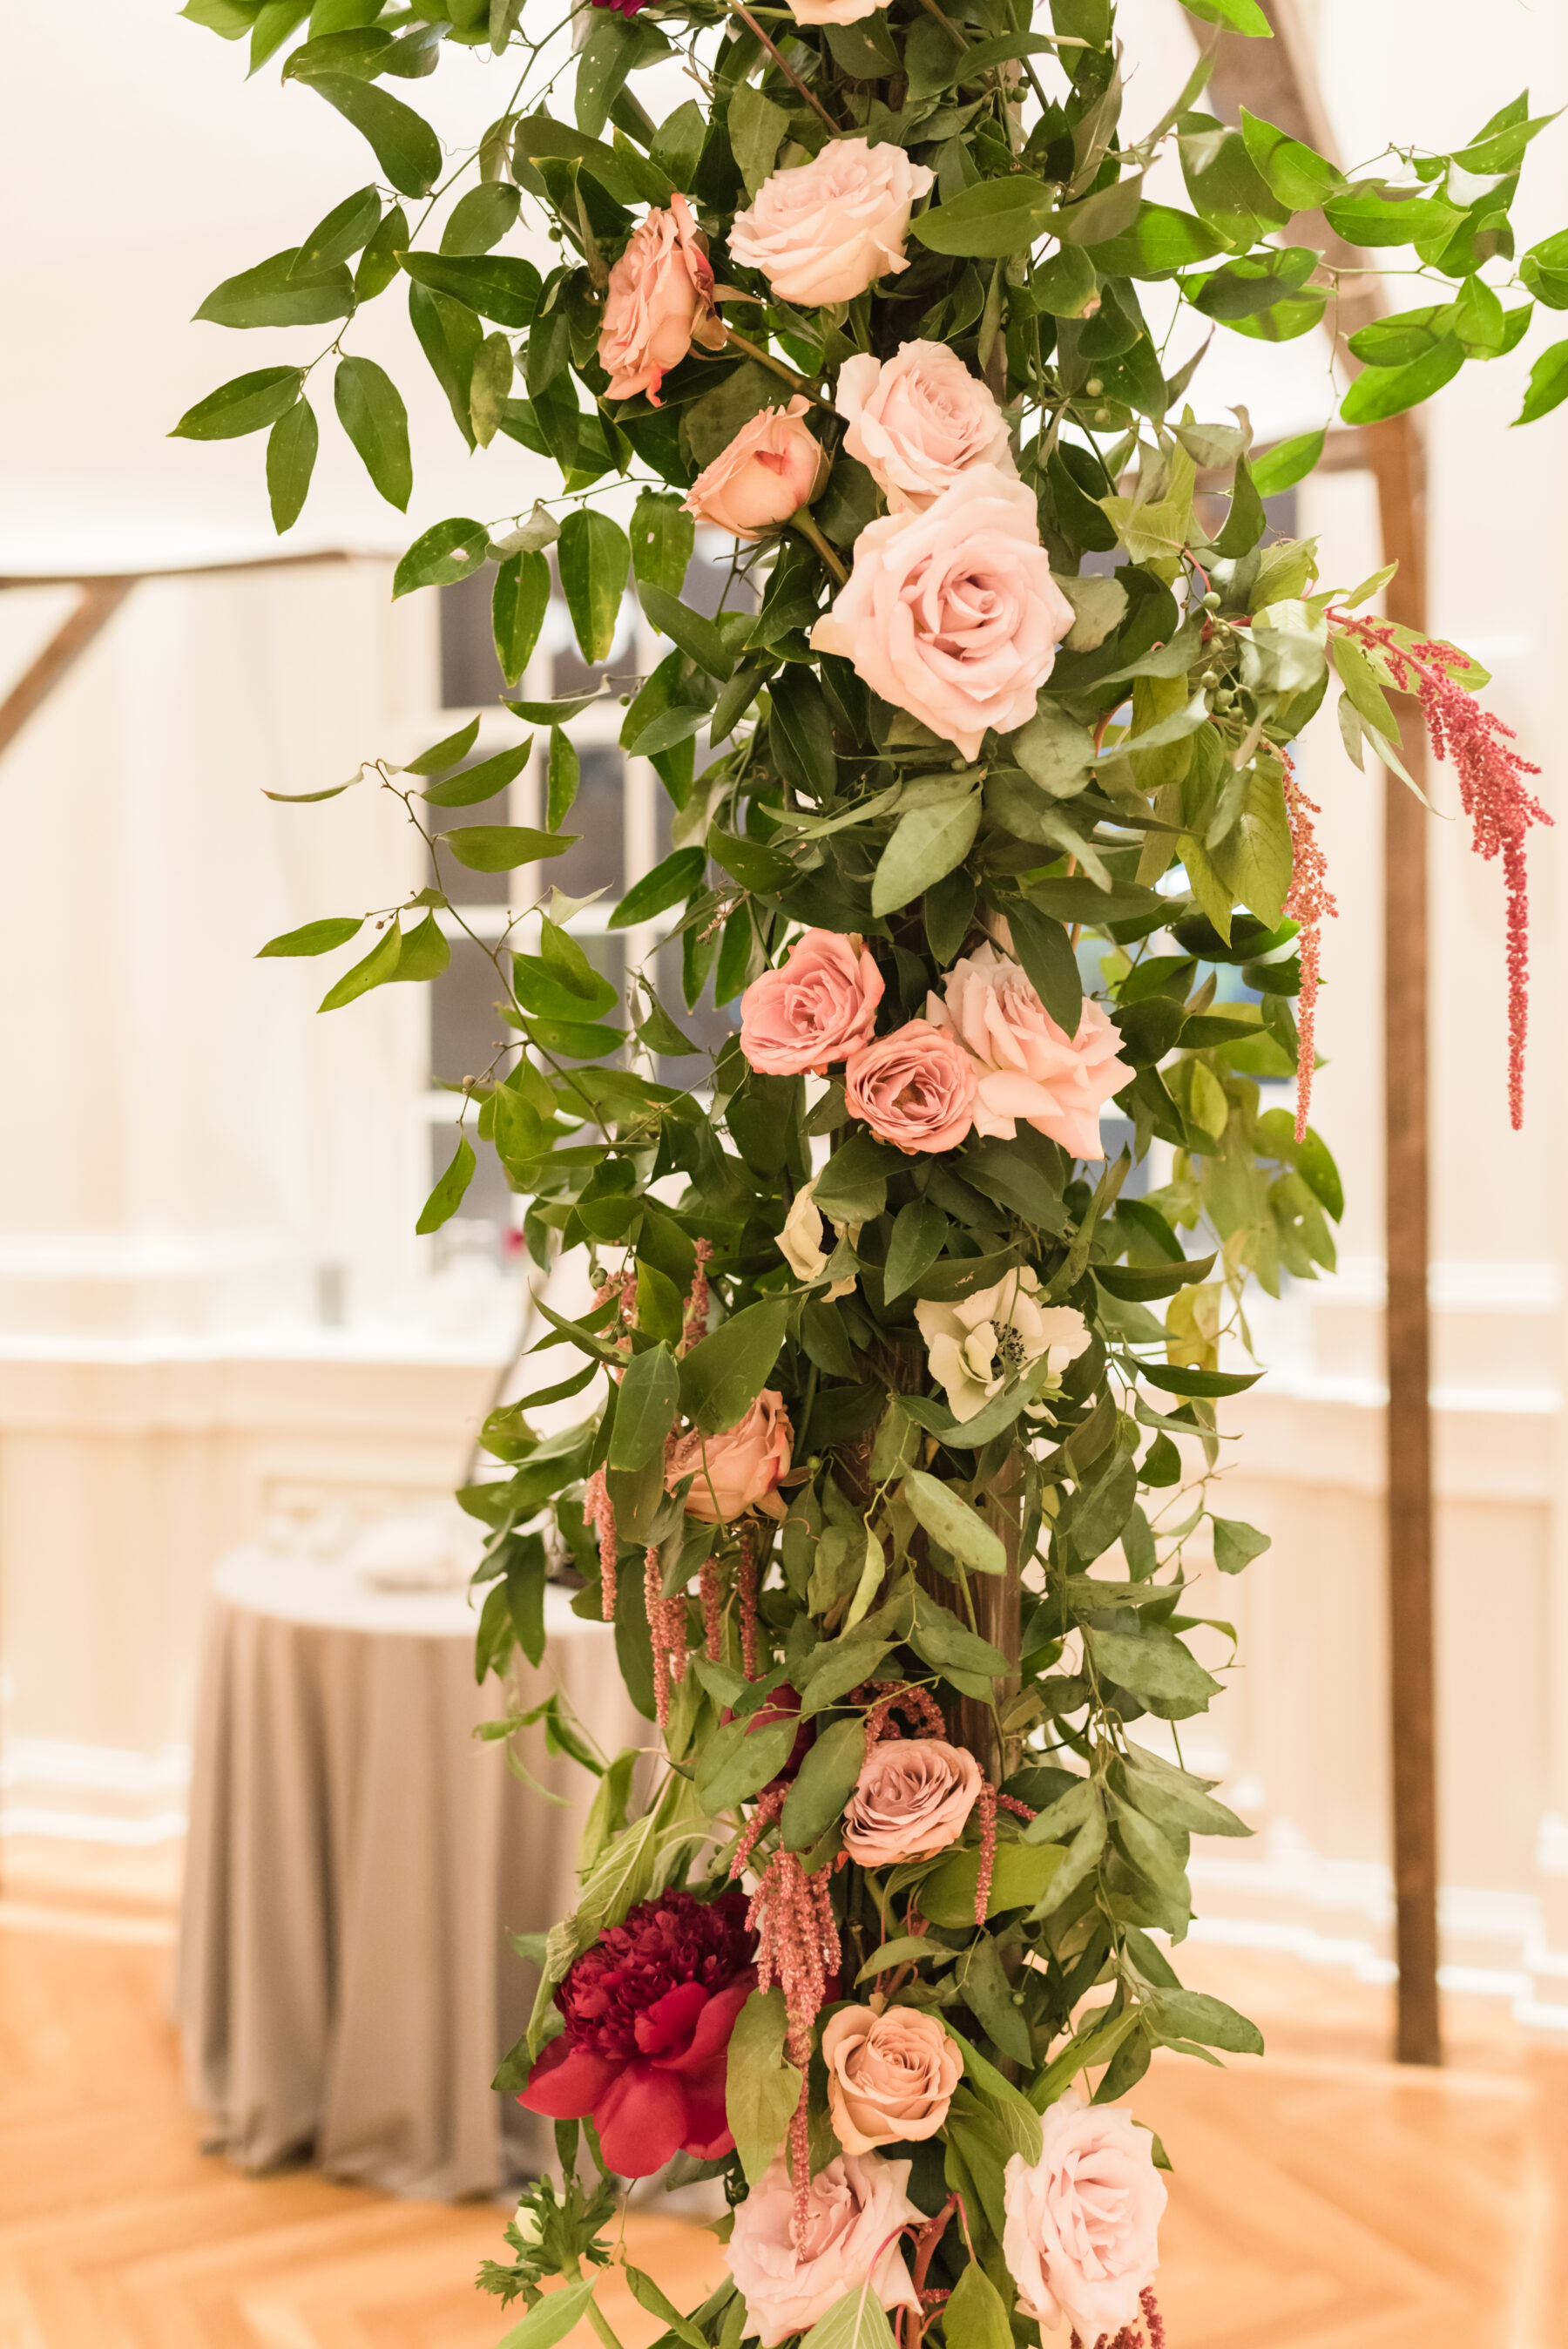 LMA Floral Designs